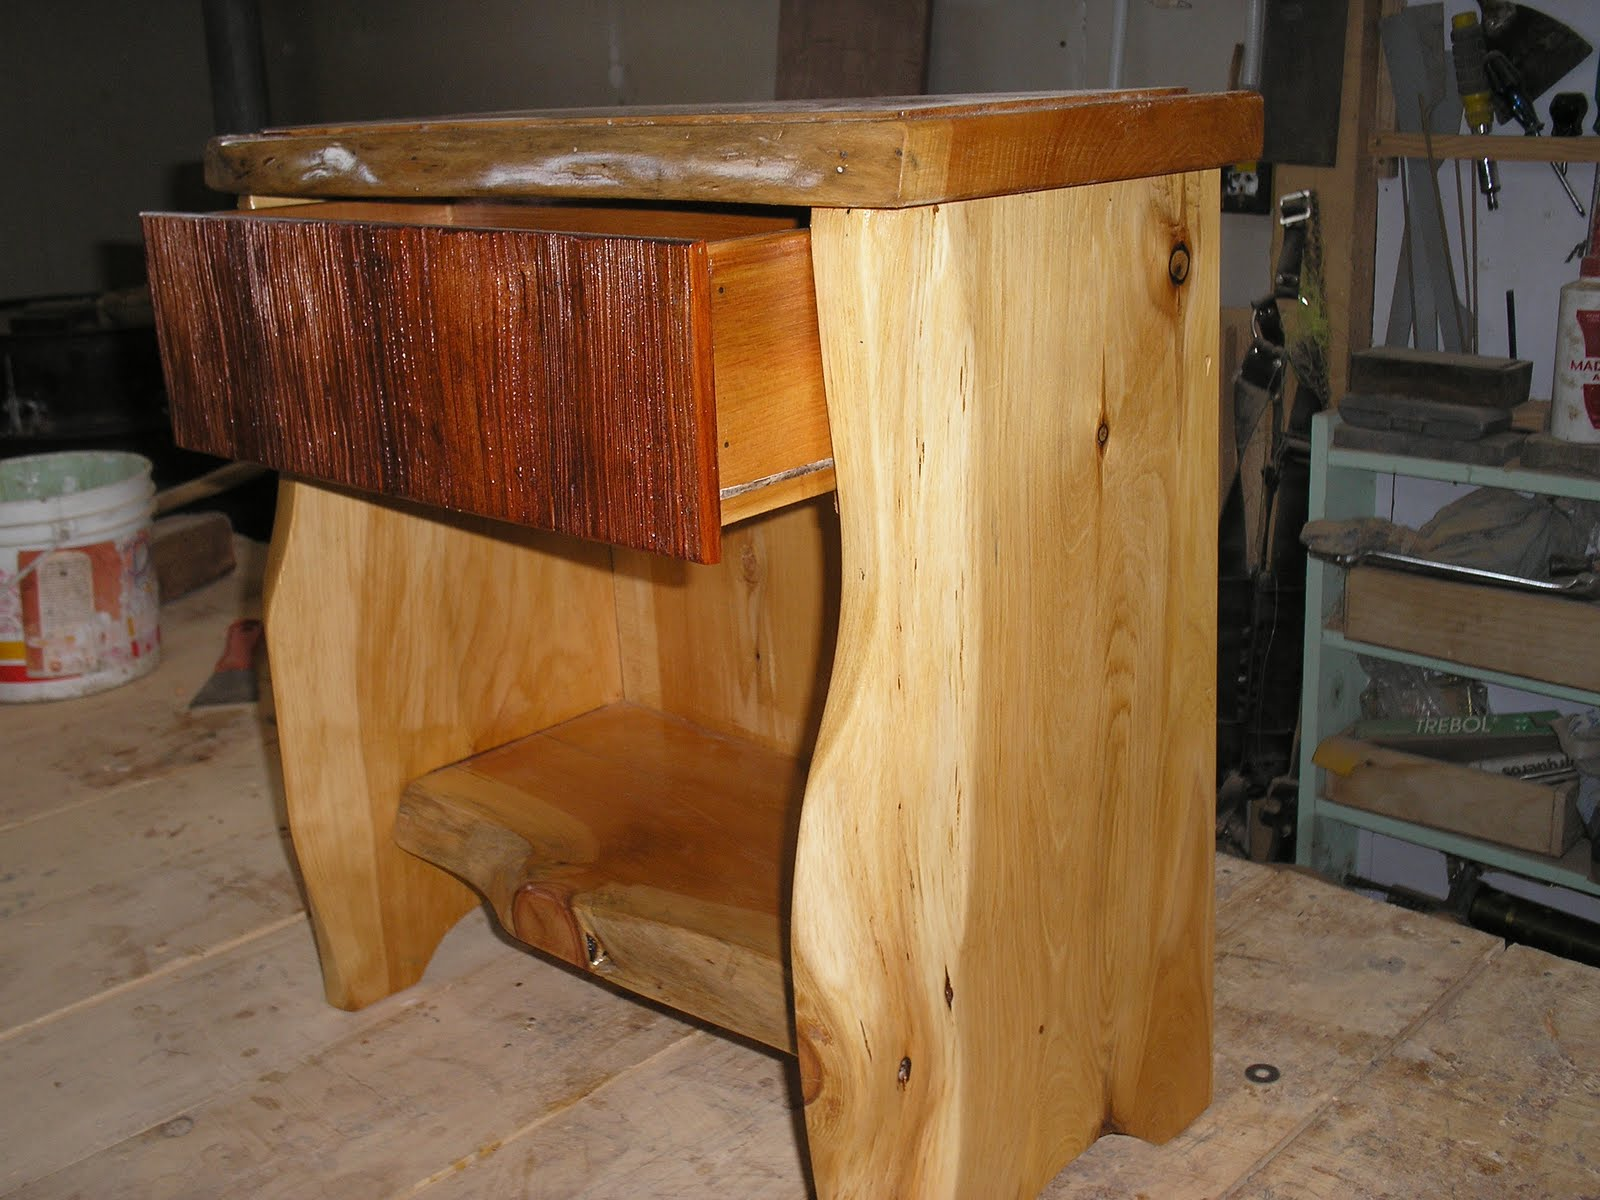 Muebles rsticos de madera muebles rsticos de madera - Muebles artesanales de madera ...